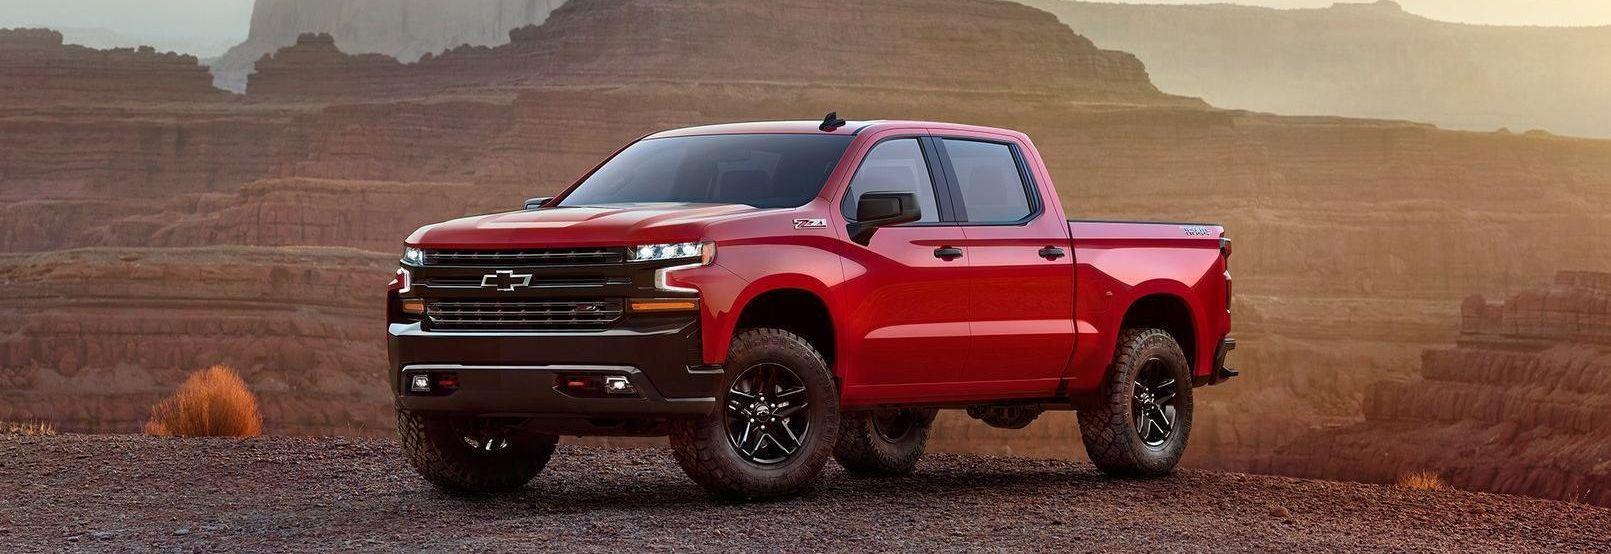 2019 Chevrolet Silverado 1500 Financing near Mobile, AL